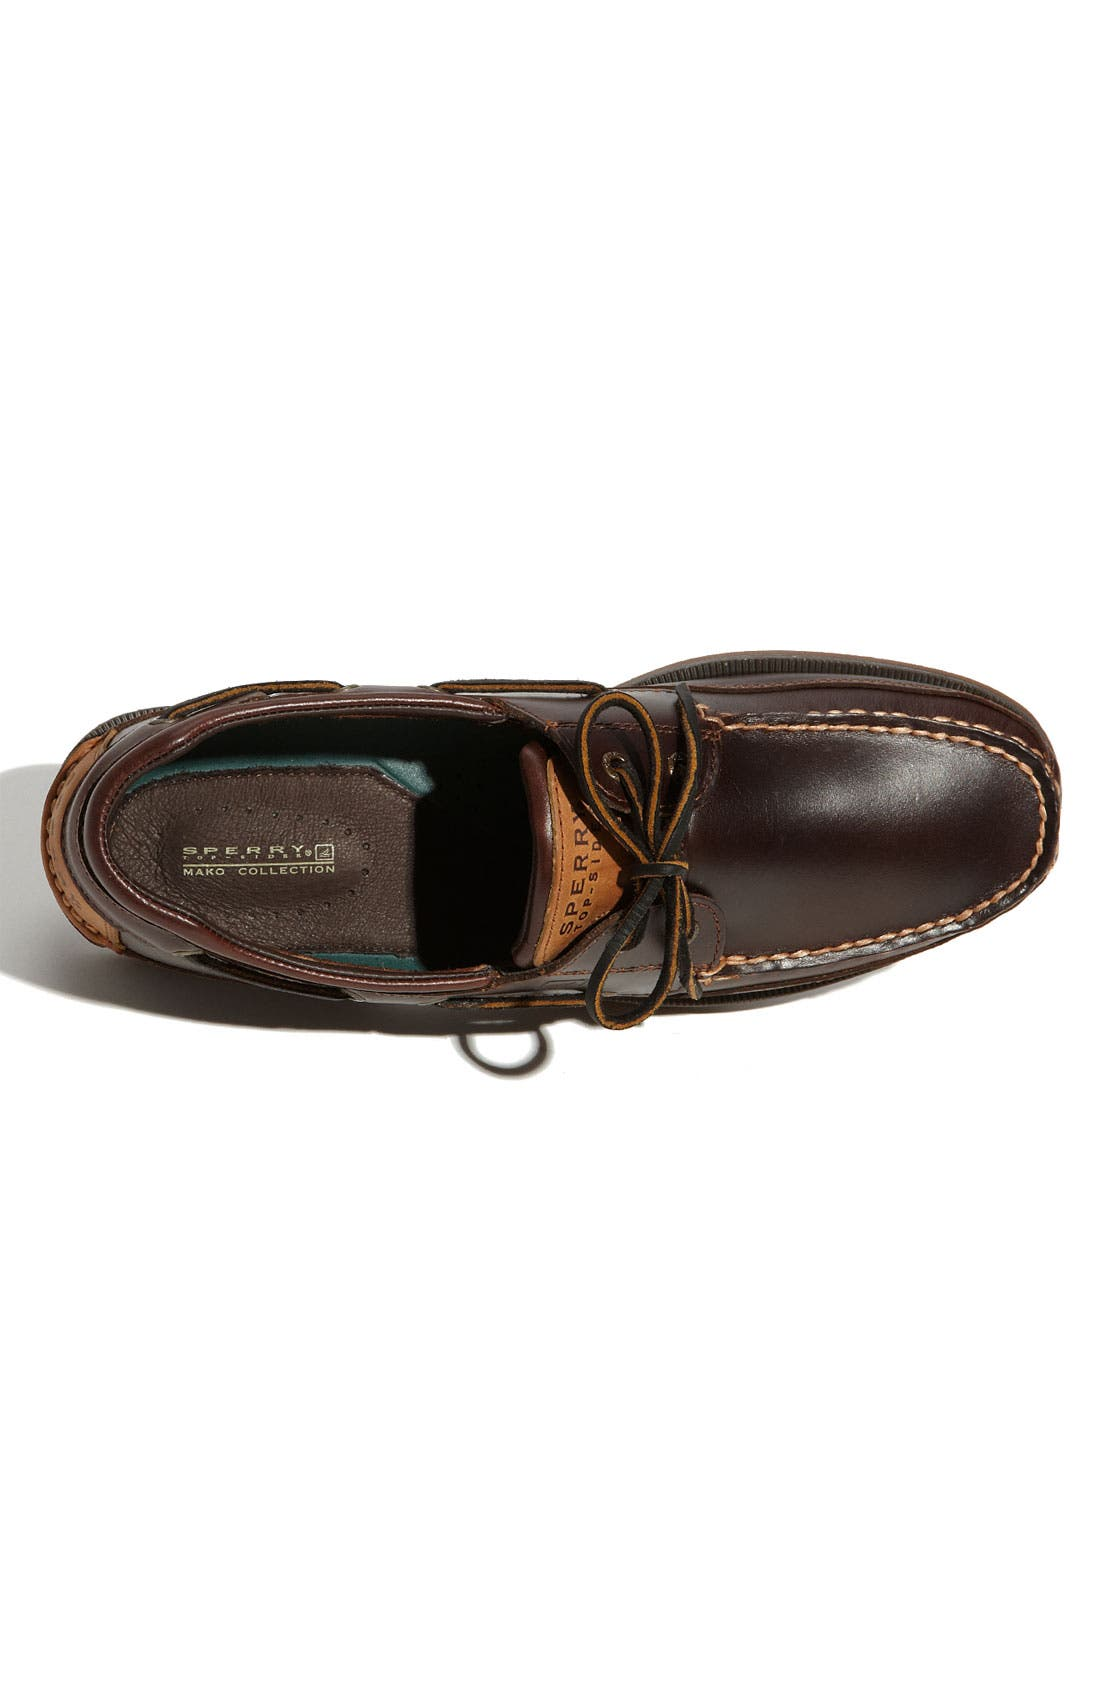 Top-Sider<sup>®</sup> 'Mako Two-Eye Canoe Moc' Boat Shoe,                             Alternate thumbnail 2, color,                             Dark Brown